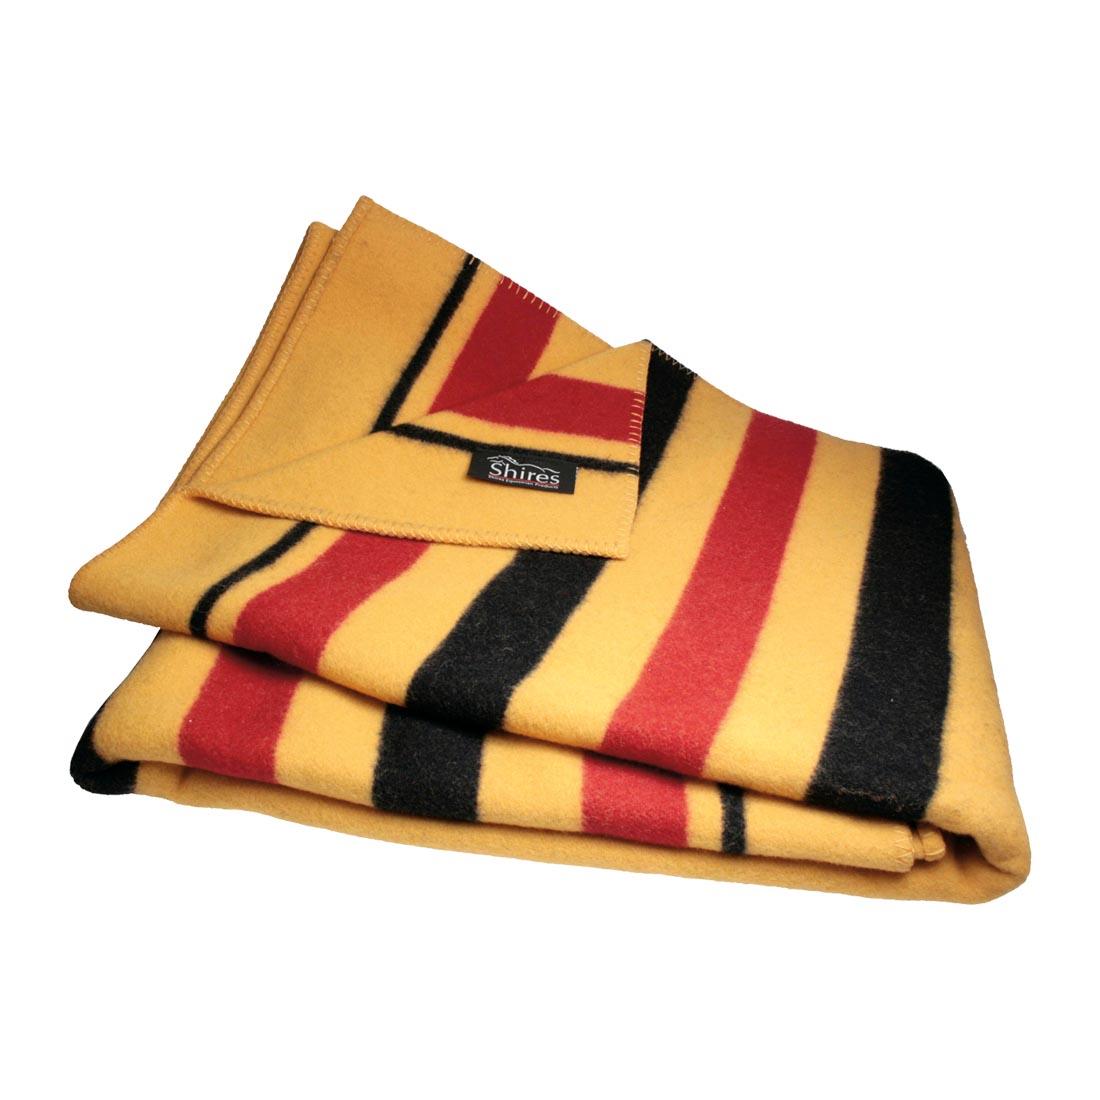 Shires Gold stripe ullteppe 180x210